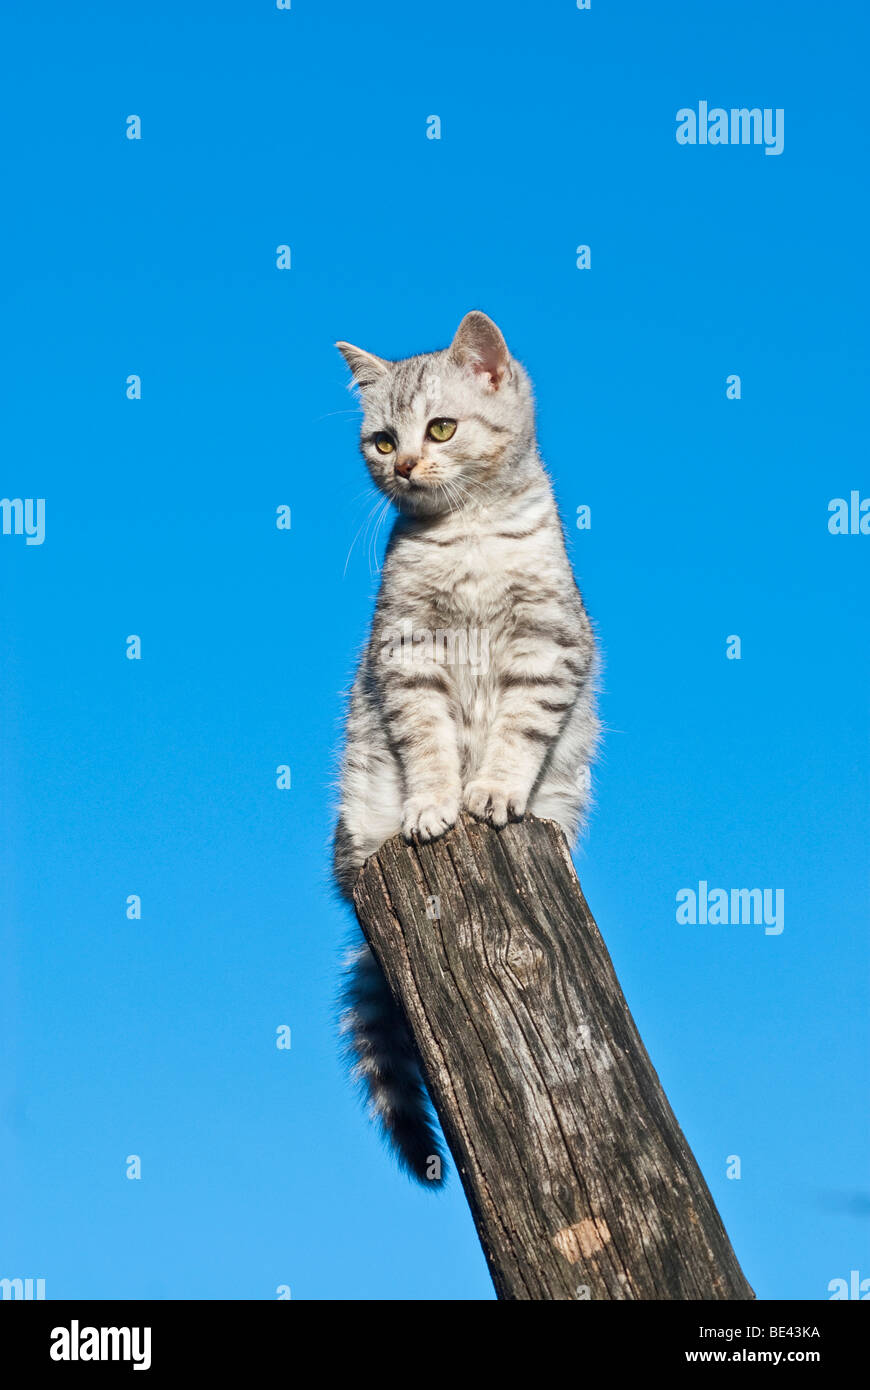 Domestic cat, 14 weeks, sitting on pole Stock Photo